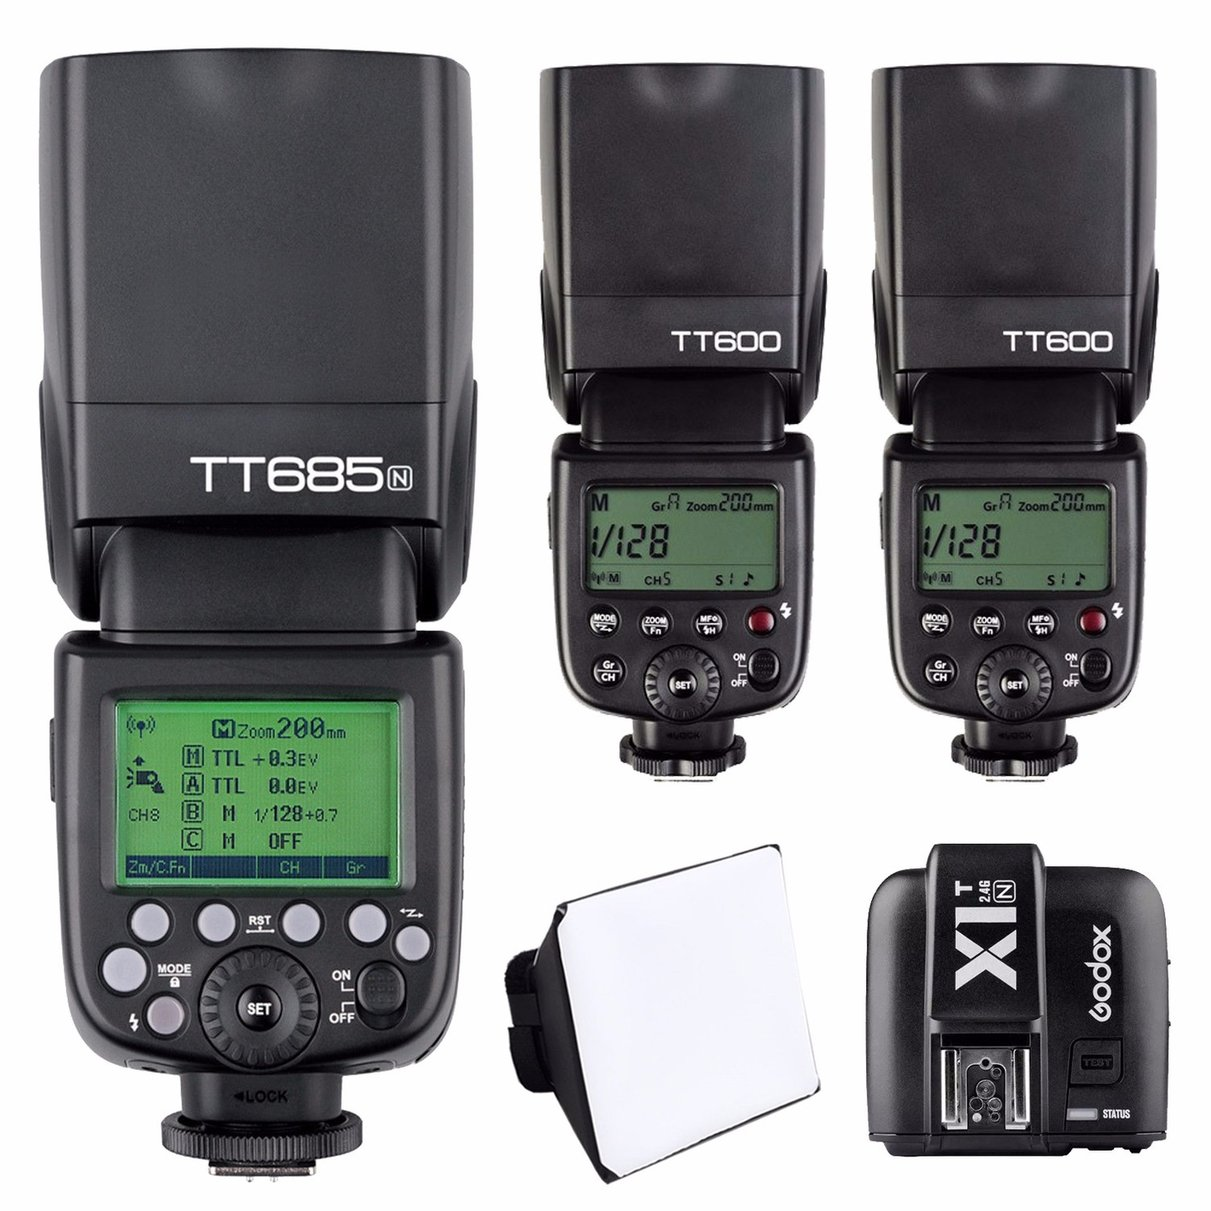 Godox TT685N TTL HSS Speedlite Flash For Nikon +2x TT600 flash for nikon DSLR camera + X1T-N 2.4G Transmitter trigger godox v860ii n v860iin gn60 i ttl hss 1 8000s speedlite flash w li ion battery x1t n flash transmitter optional for nikon